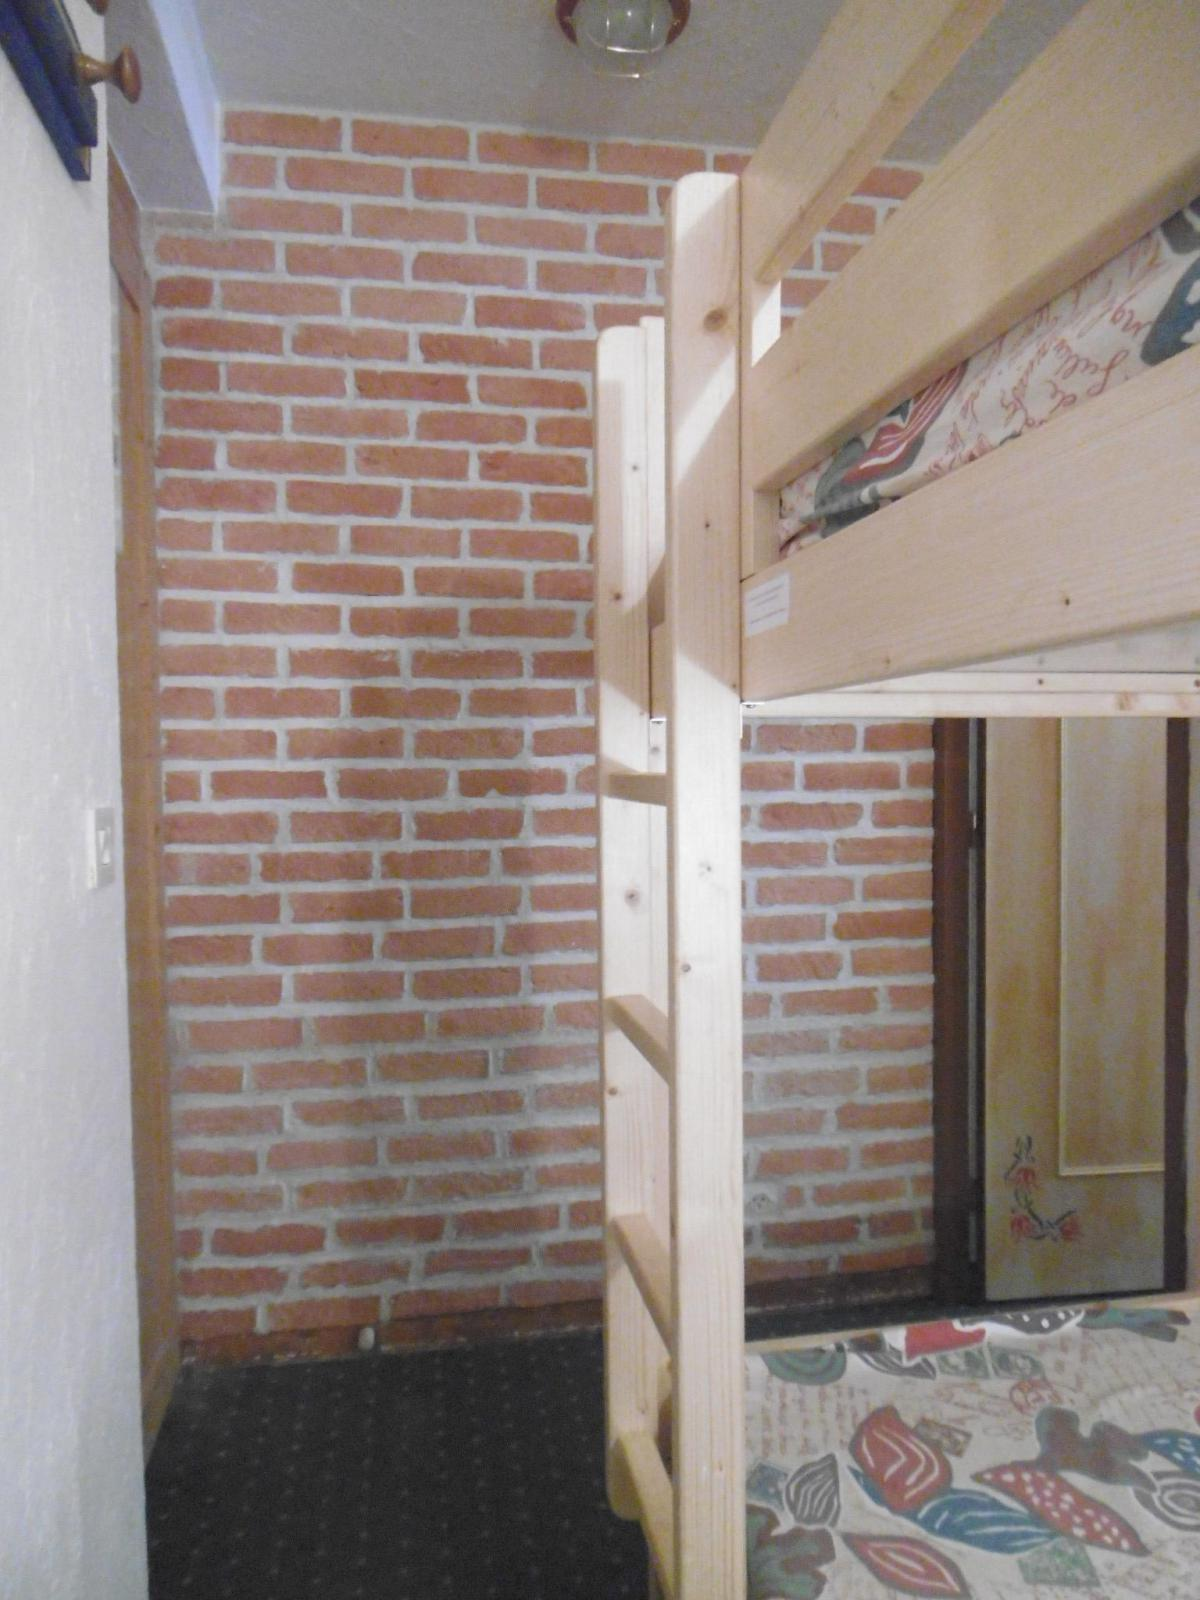 Location au ski Studio 4 personnes (102) - Residence Pralin - Mottaret